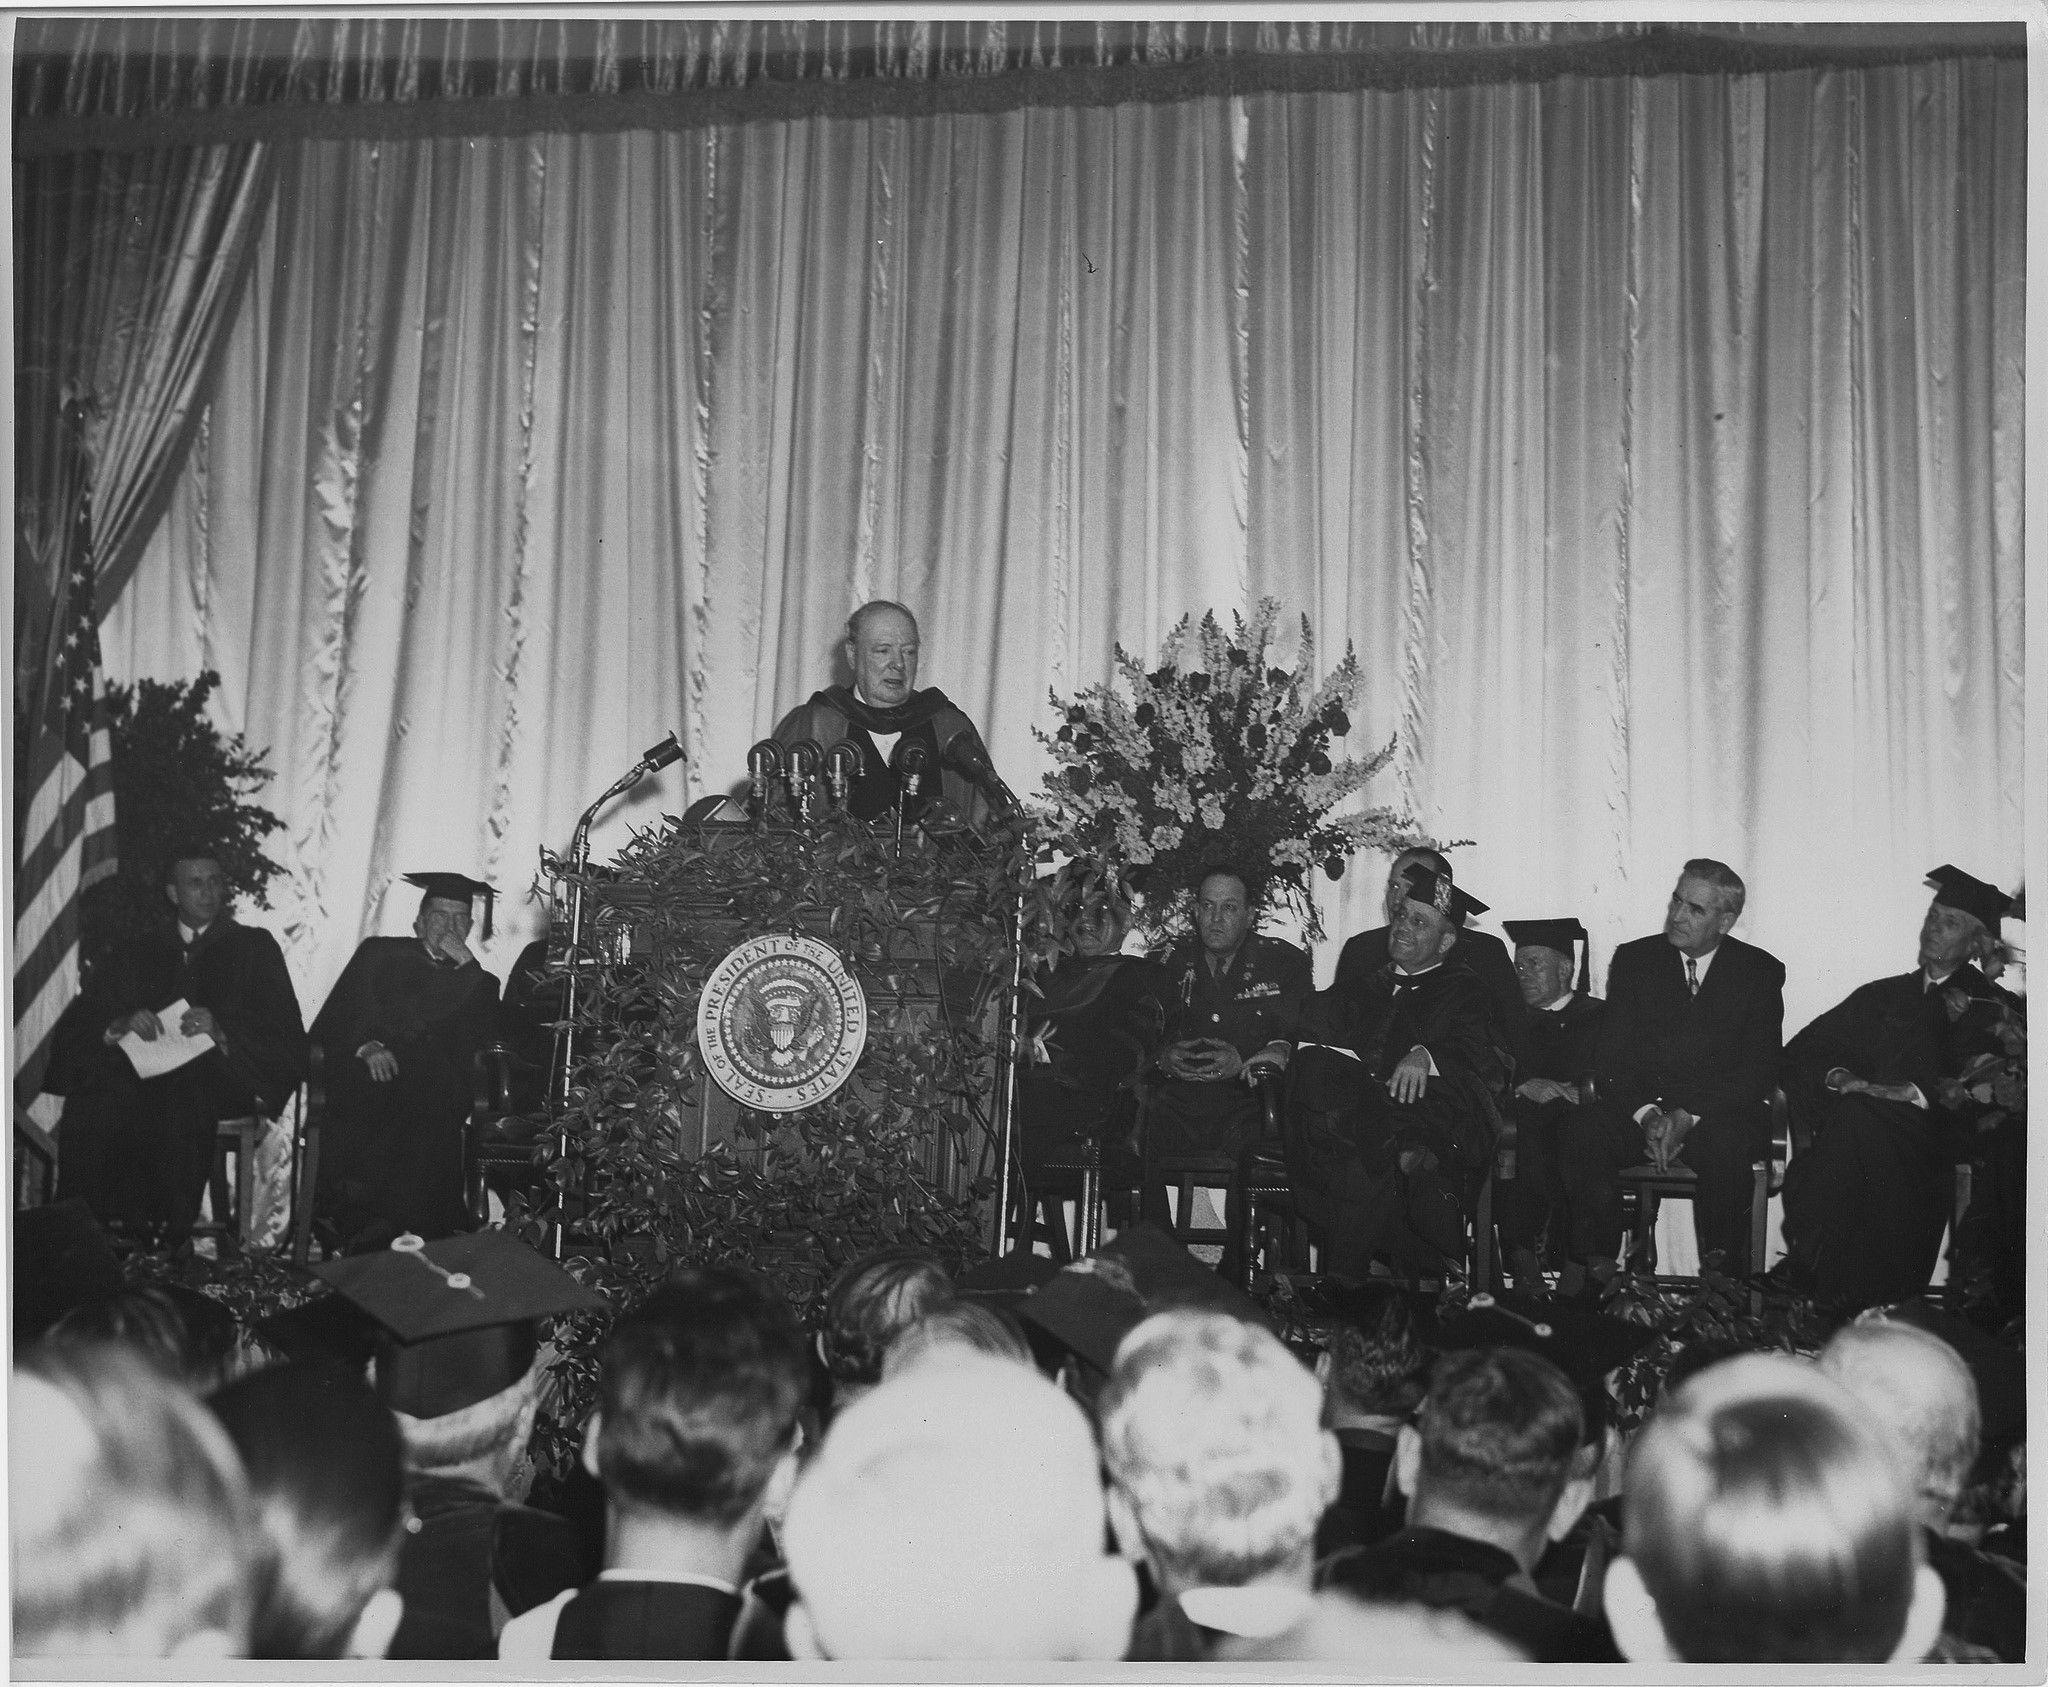 Iron curtain speech - Political Winston Churchill Iron Curtain Speech At Westminster College 1946 Churchill Condemns